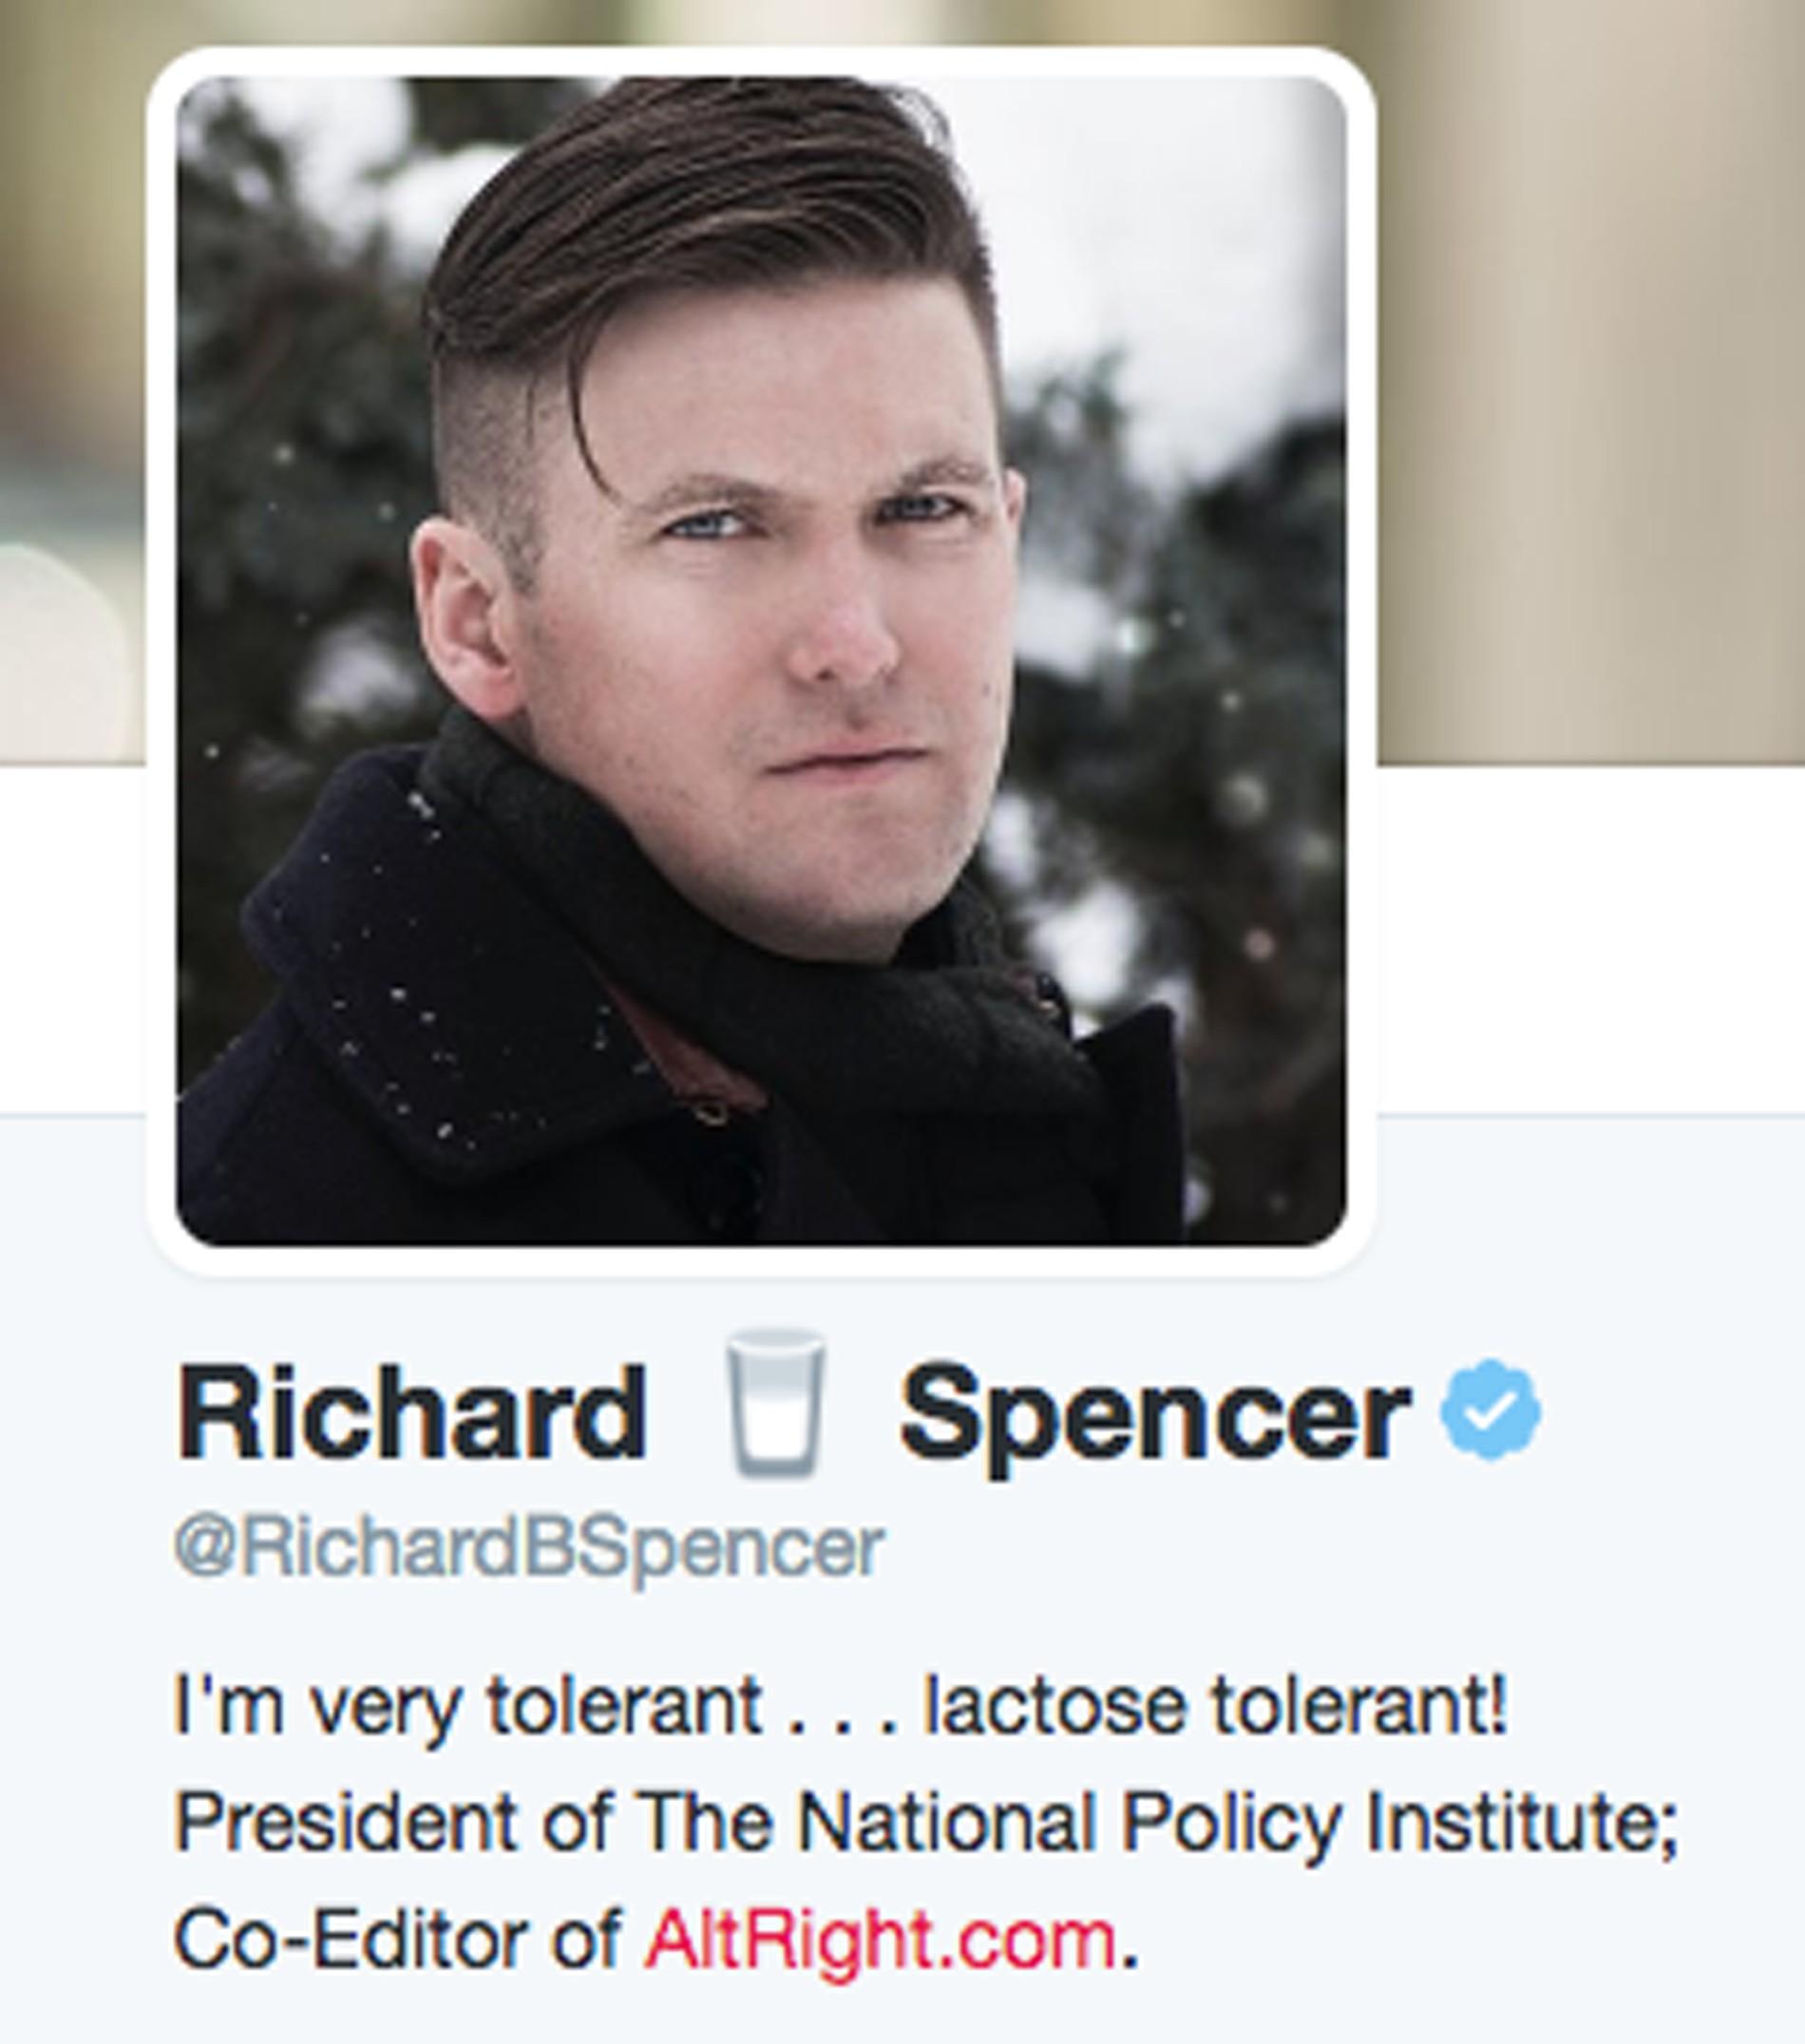 Screengrab via Twitter user @RichardBSpencer